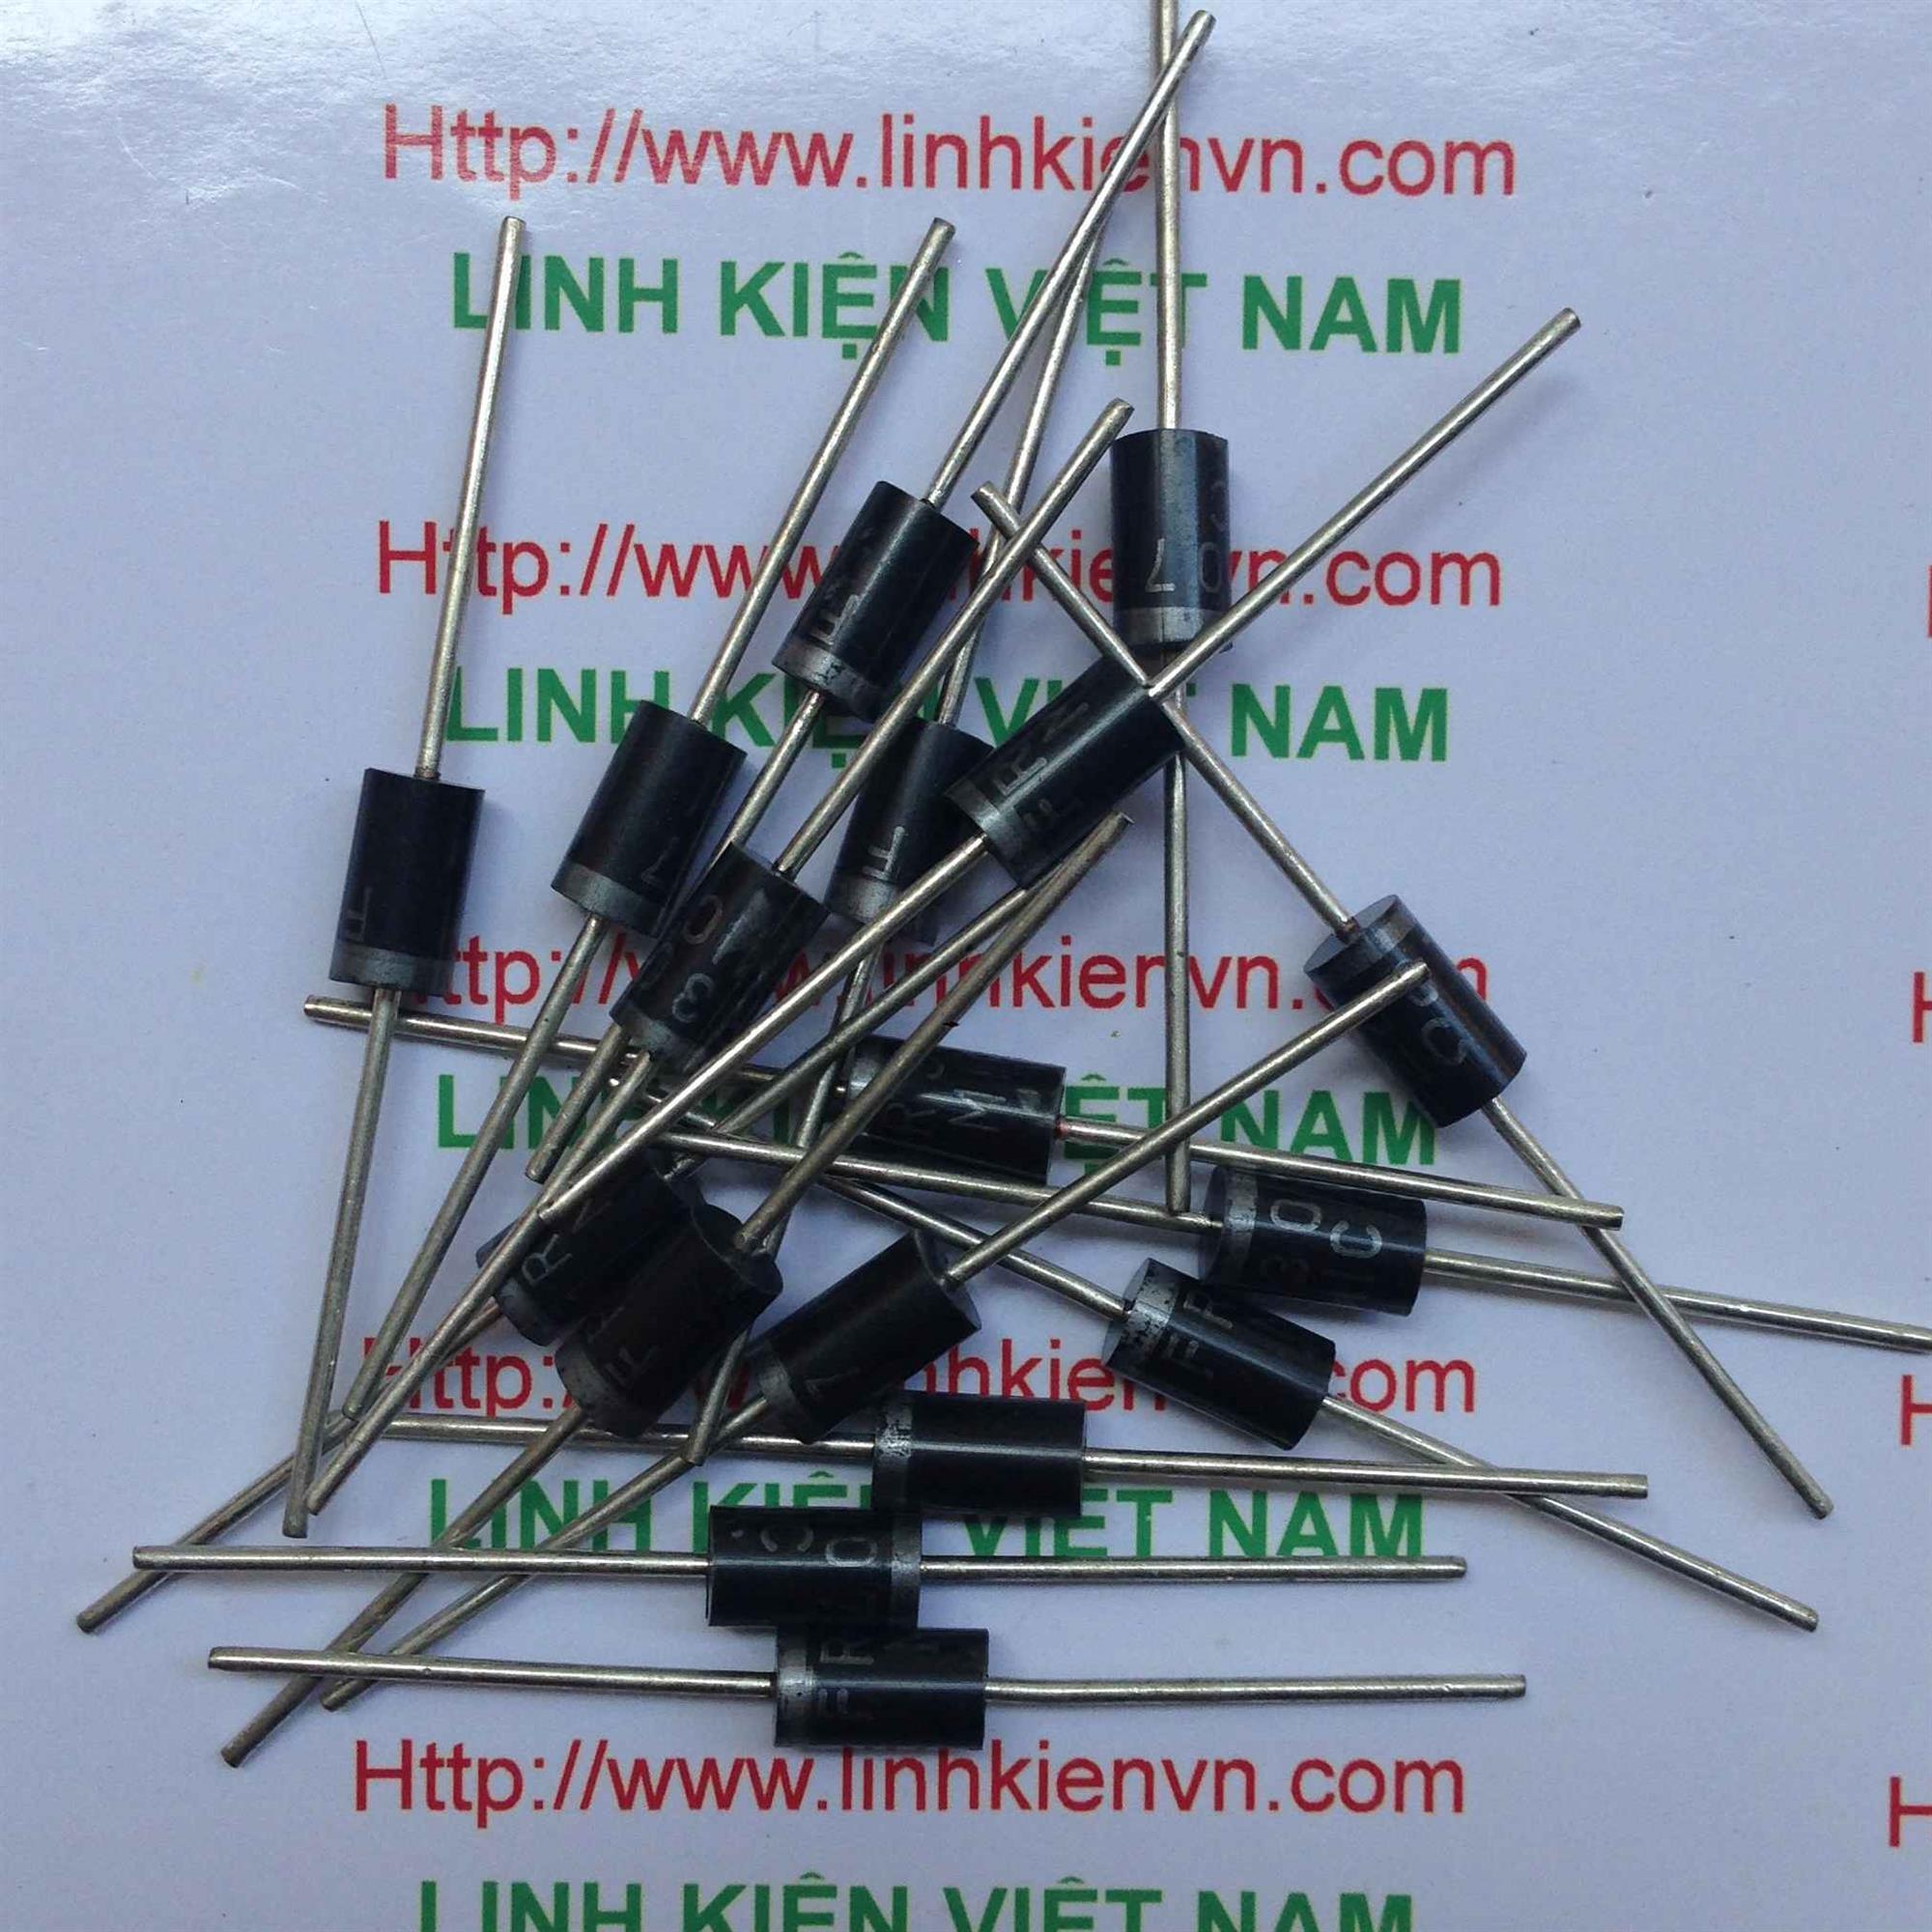 [BÁN BUÔN] Diode FR307 - 3A - 1 hộp 250 chiếc - B6H12(KB3H3)